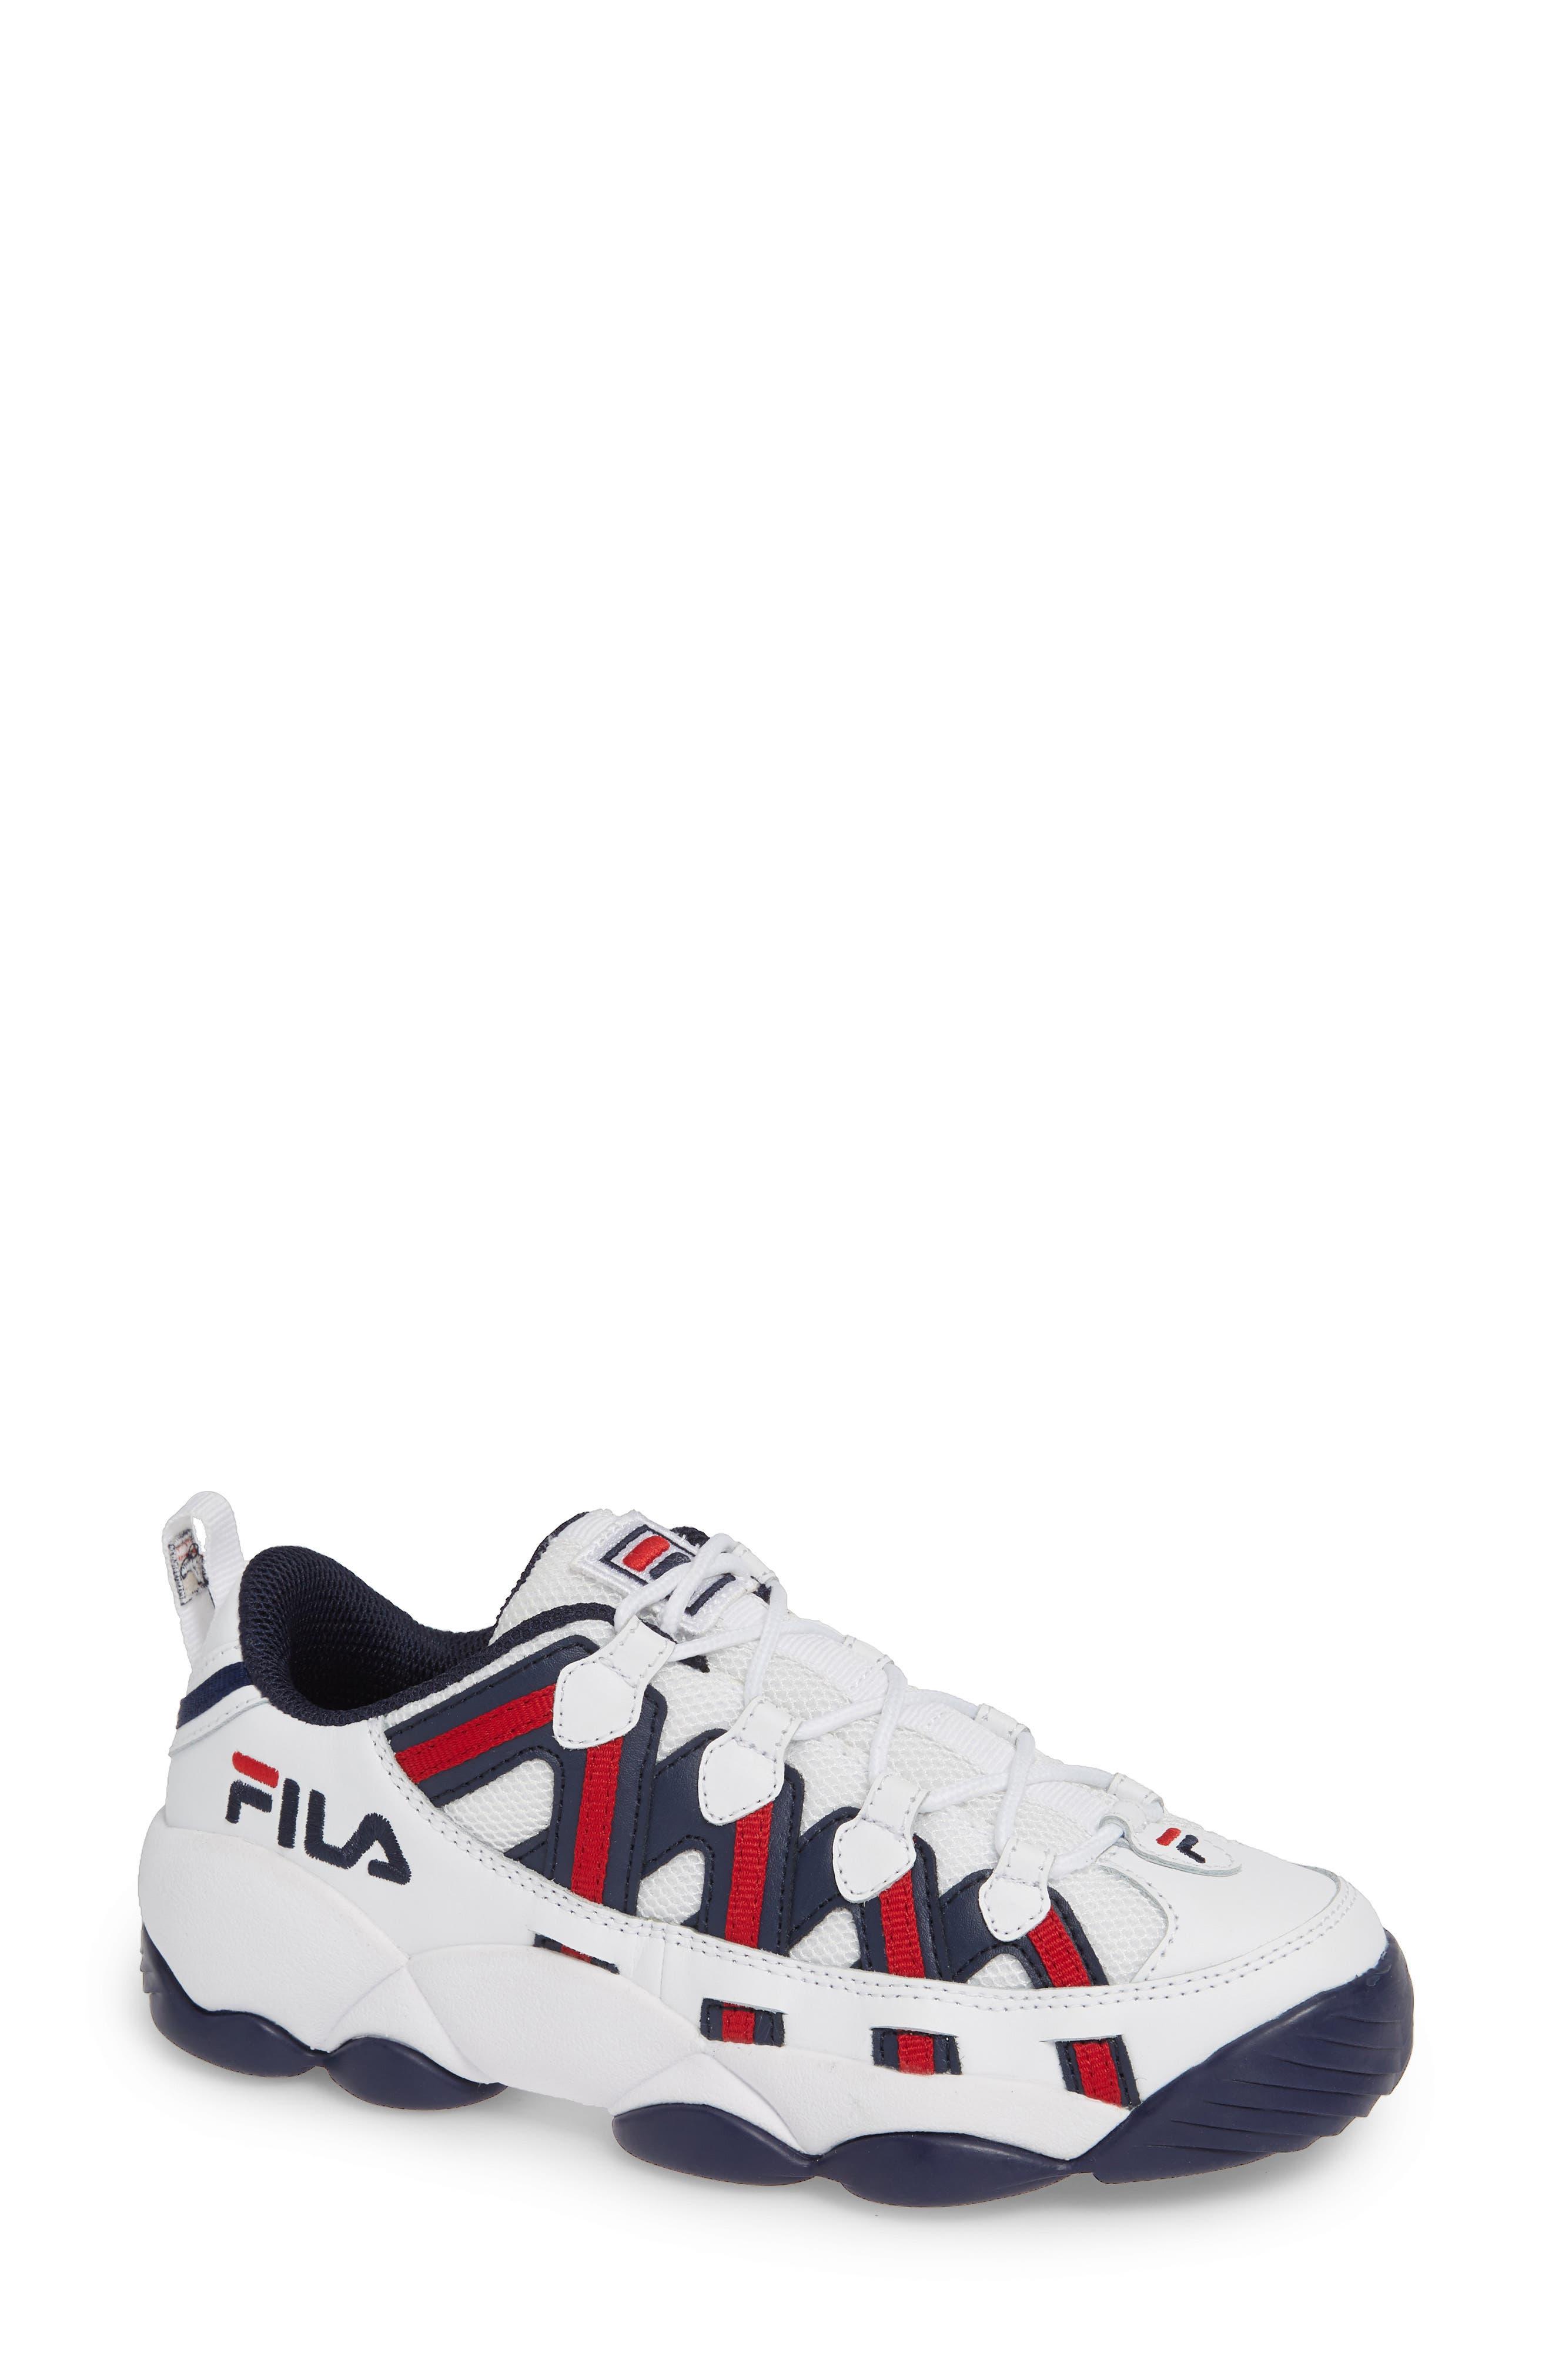 FILA, Spaghetti Low Sneaker, Main thumbnail 1, color, WHITE/ FILA NAVY/ FILA RED